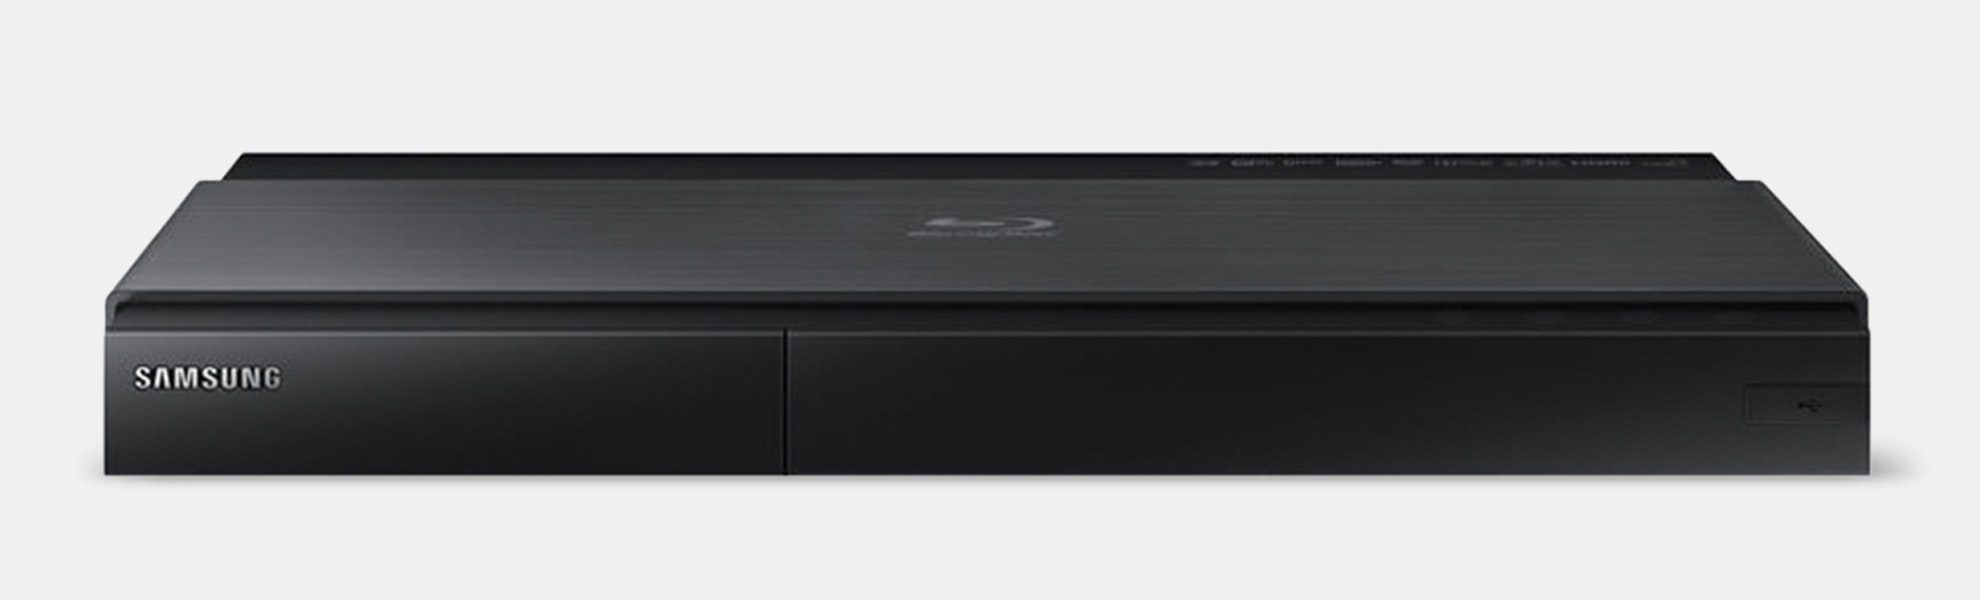 Samsung BDJ7500 3D Wi-Fi Smart 4K Blu-Ray Player